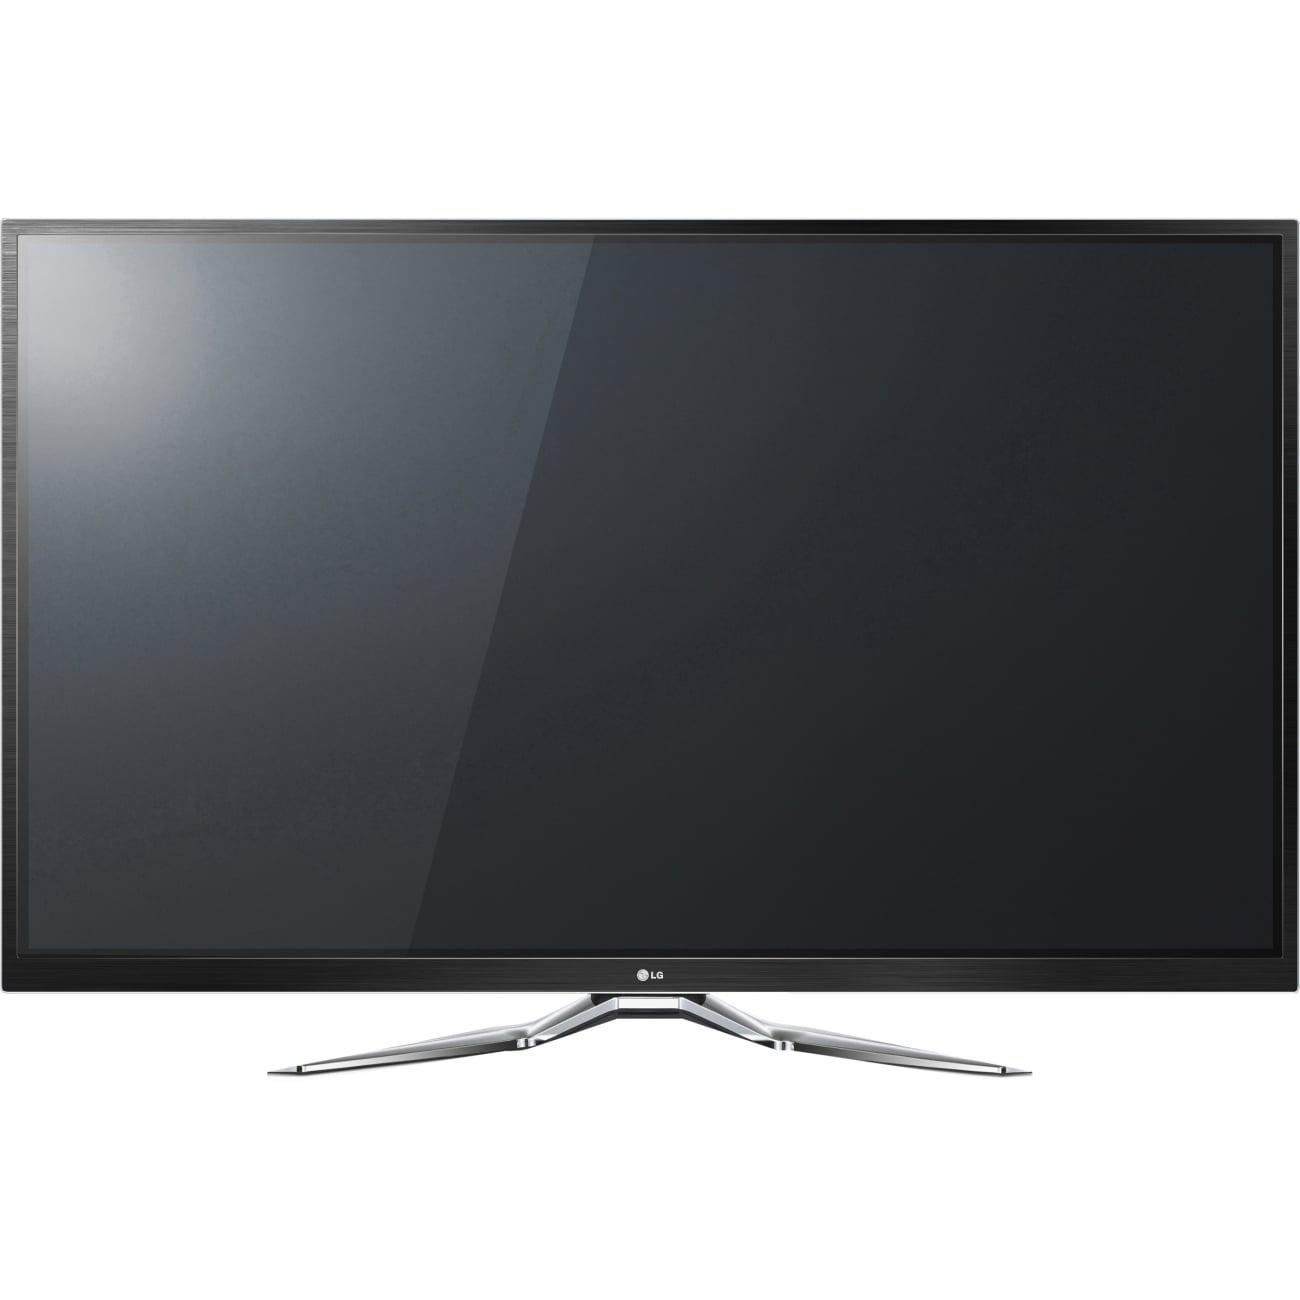 "LG 50PM9700 50"" 3D 1080p Plasma TV - 16:9 - HDTV 1080p - 600 Hz"